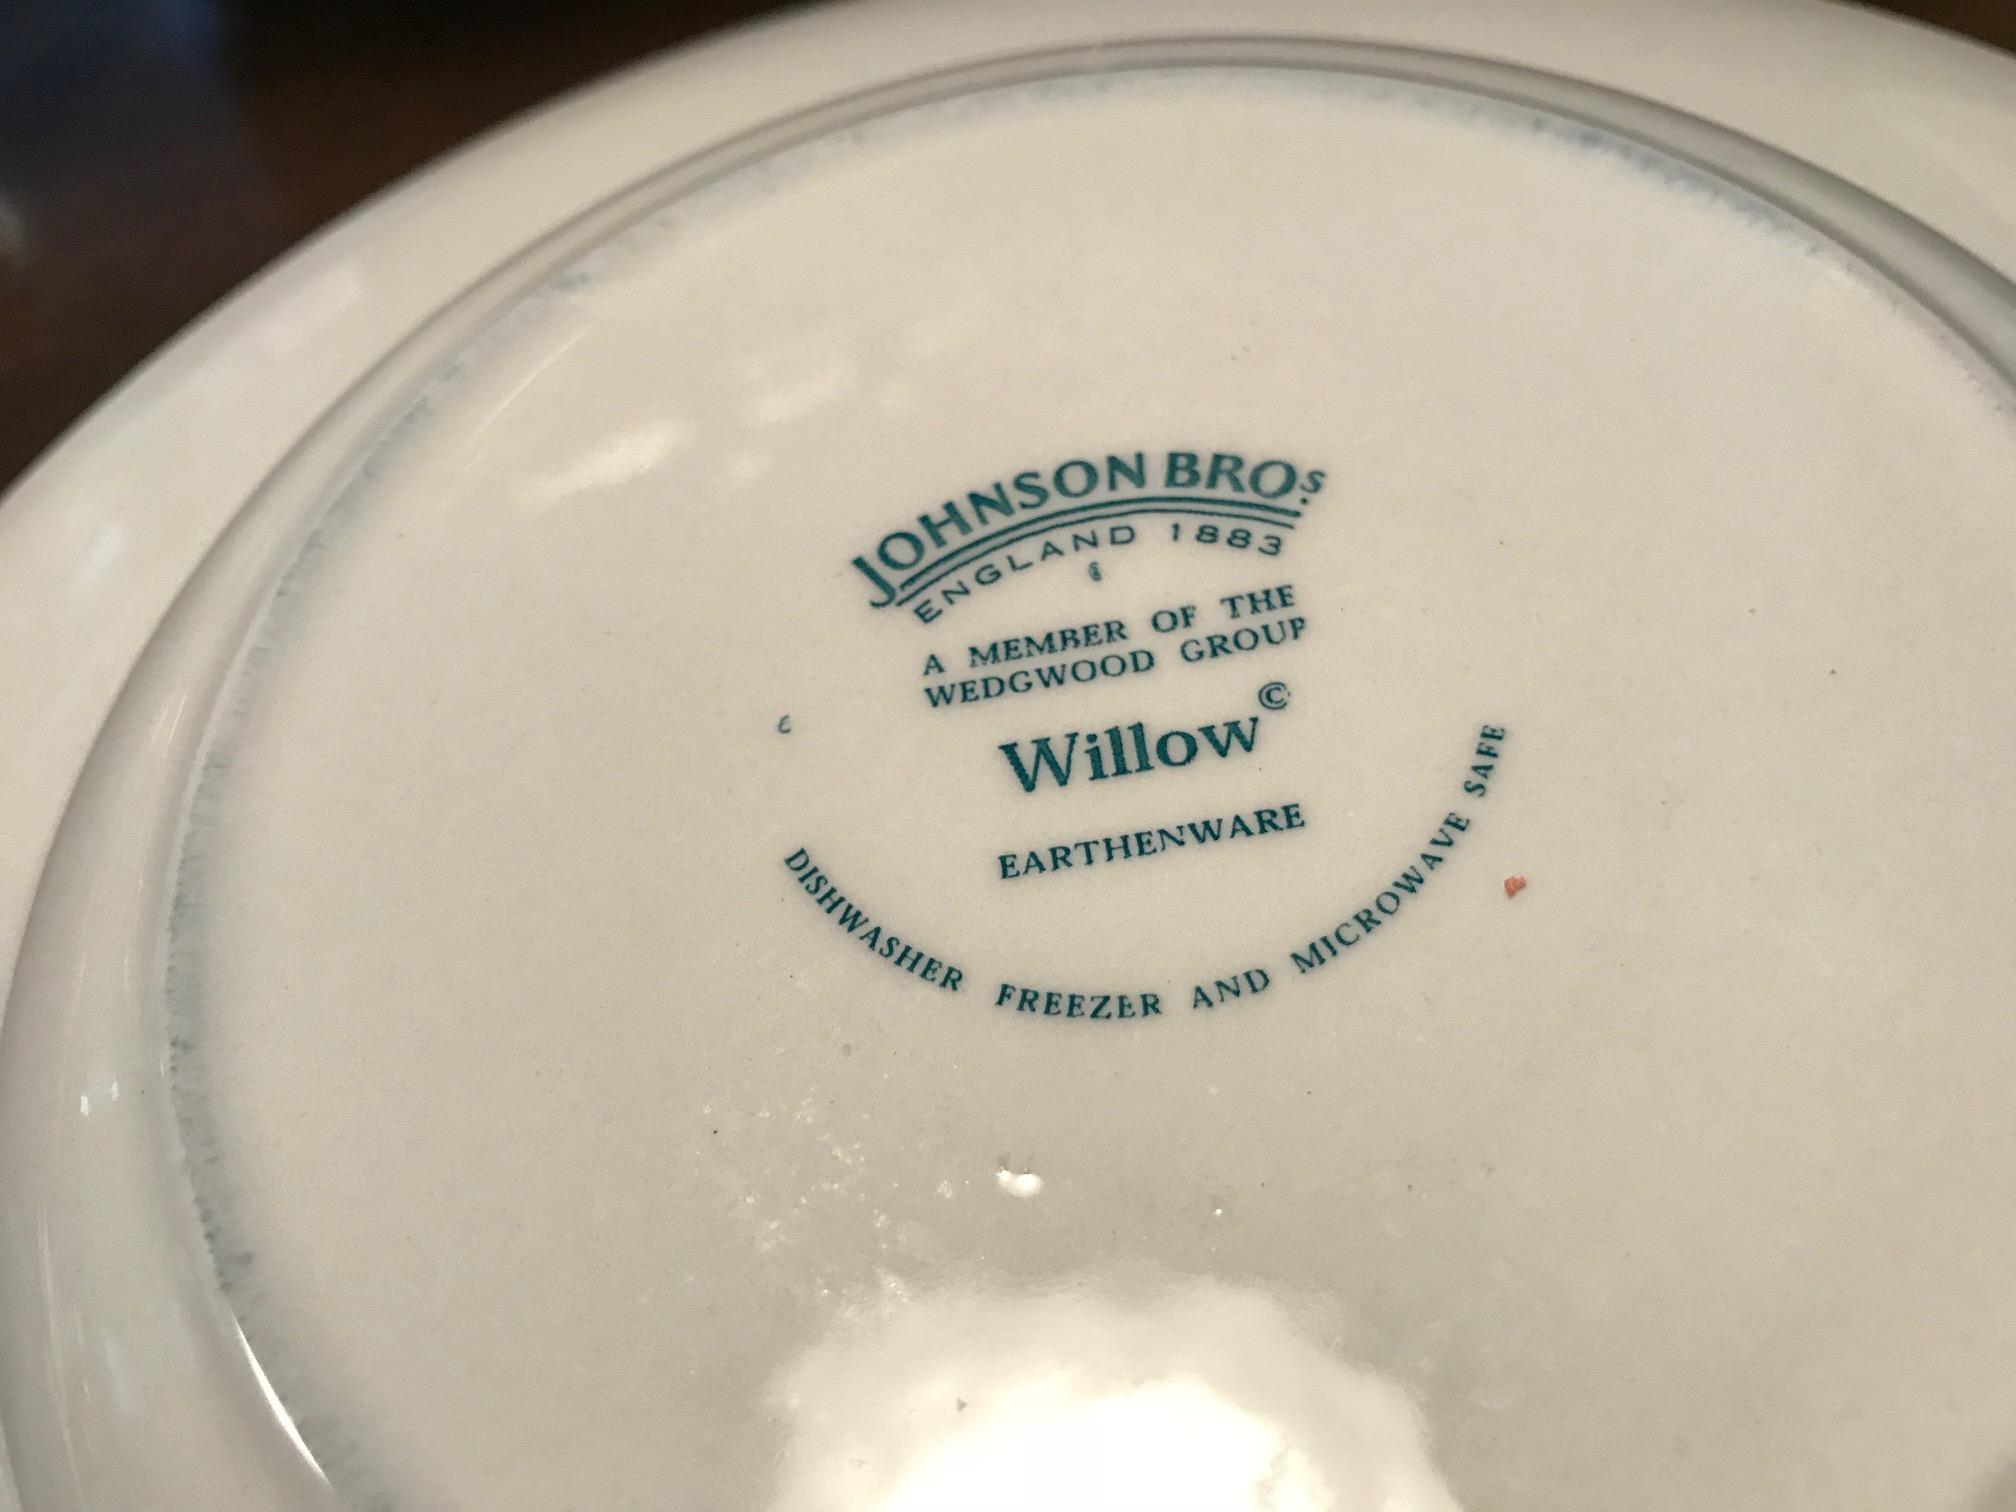 Johnson Brothers Wedgwood Group Willow Earthenware Pasta Bowl Tamara Rubin Lead Safe Mama